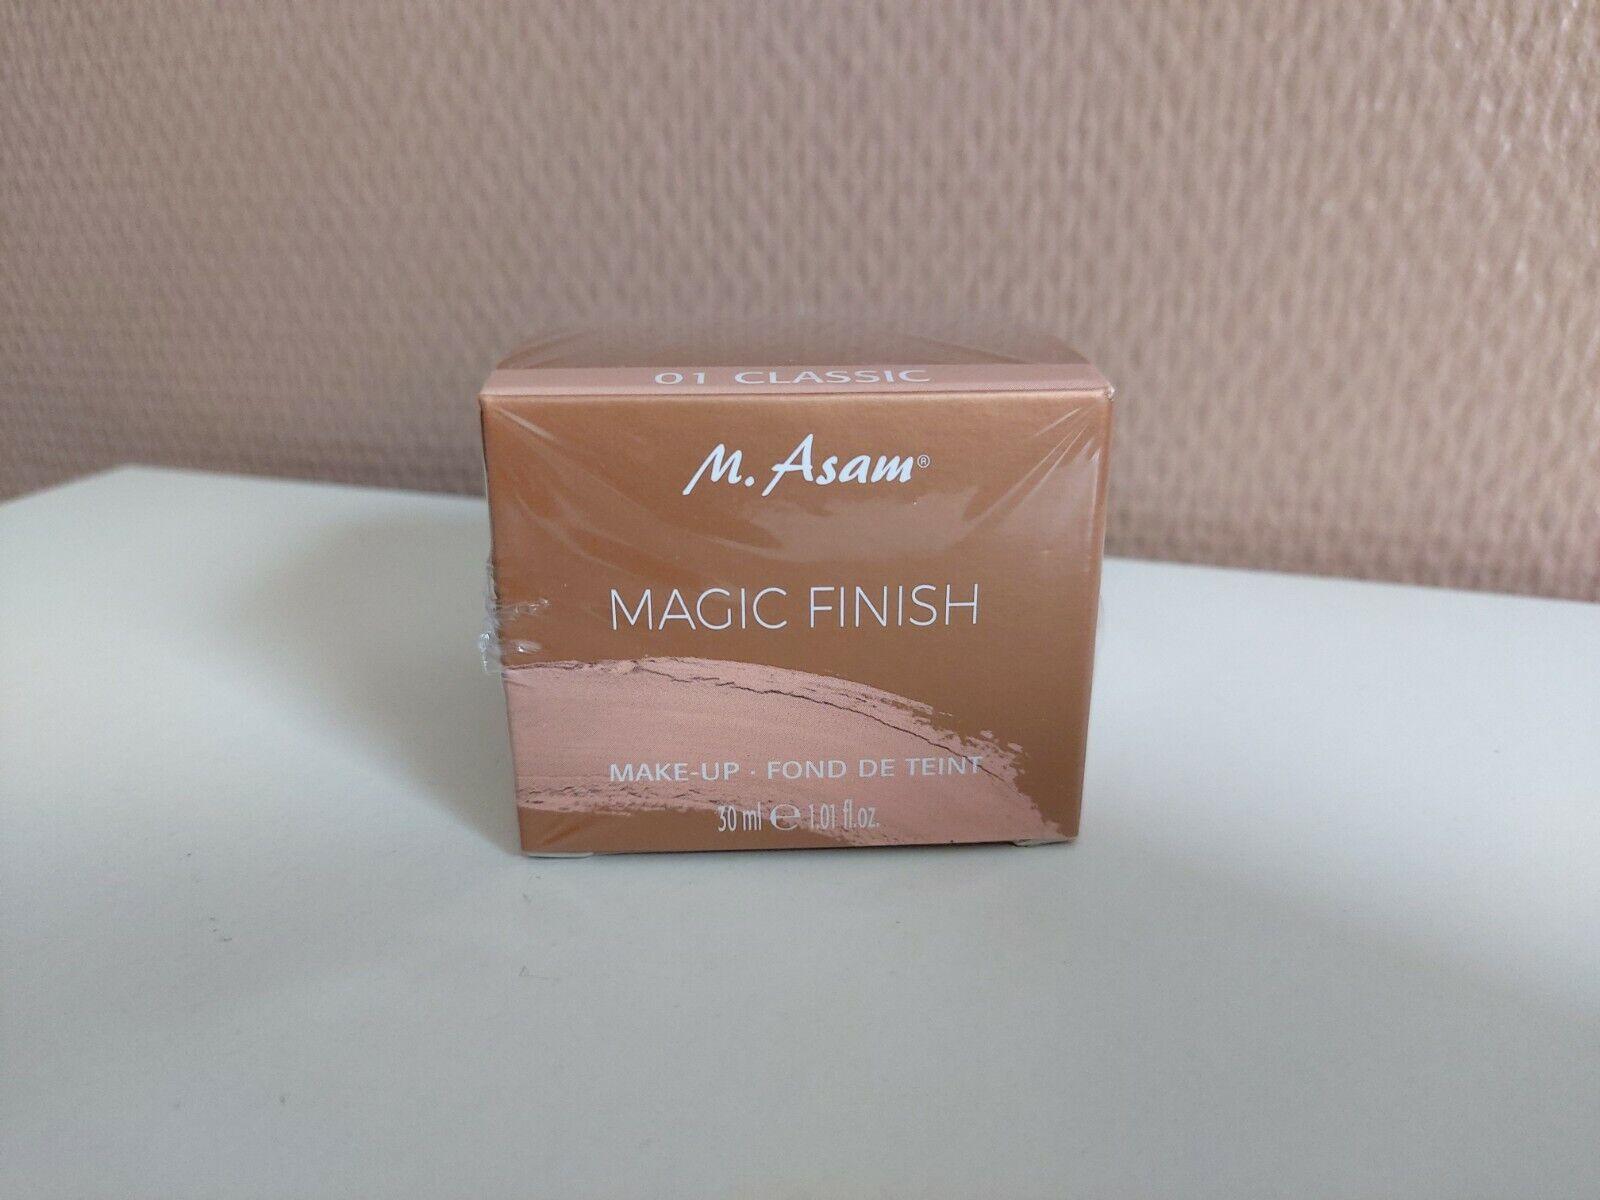 M.Asam Magic Finish Make-Up-Fond De Teint 30 ml neu